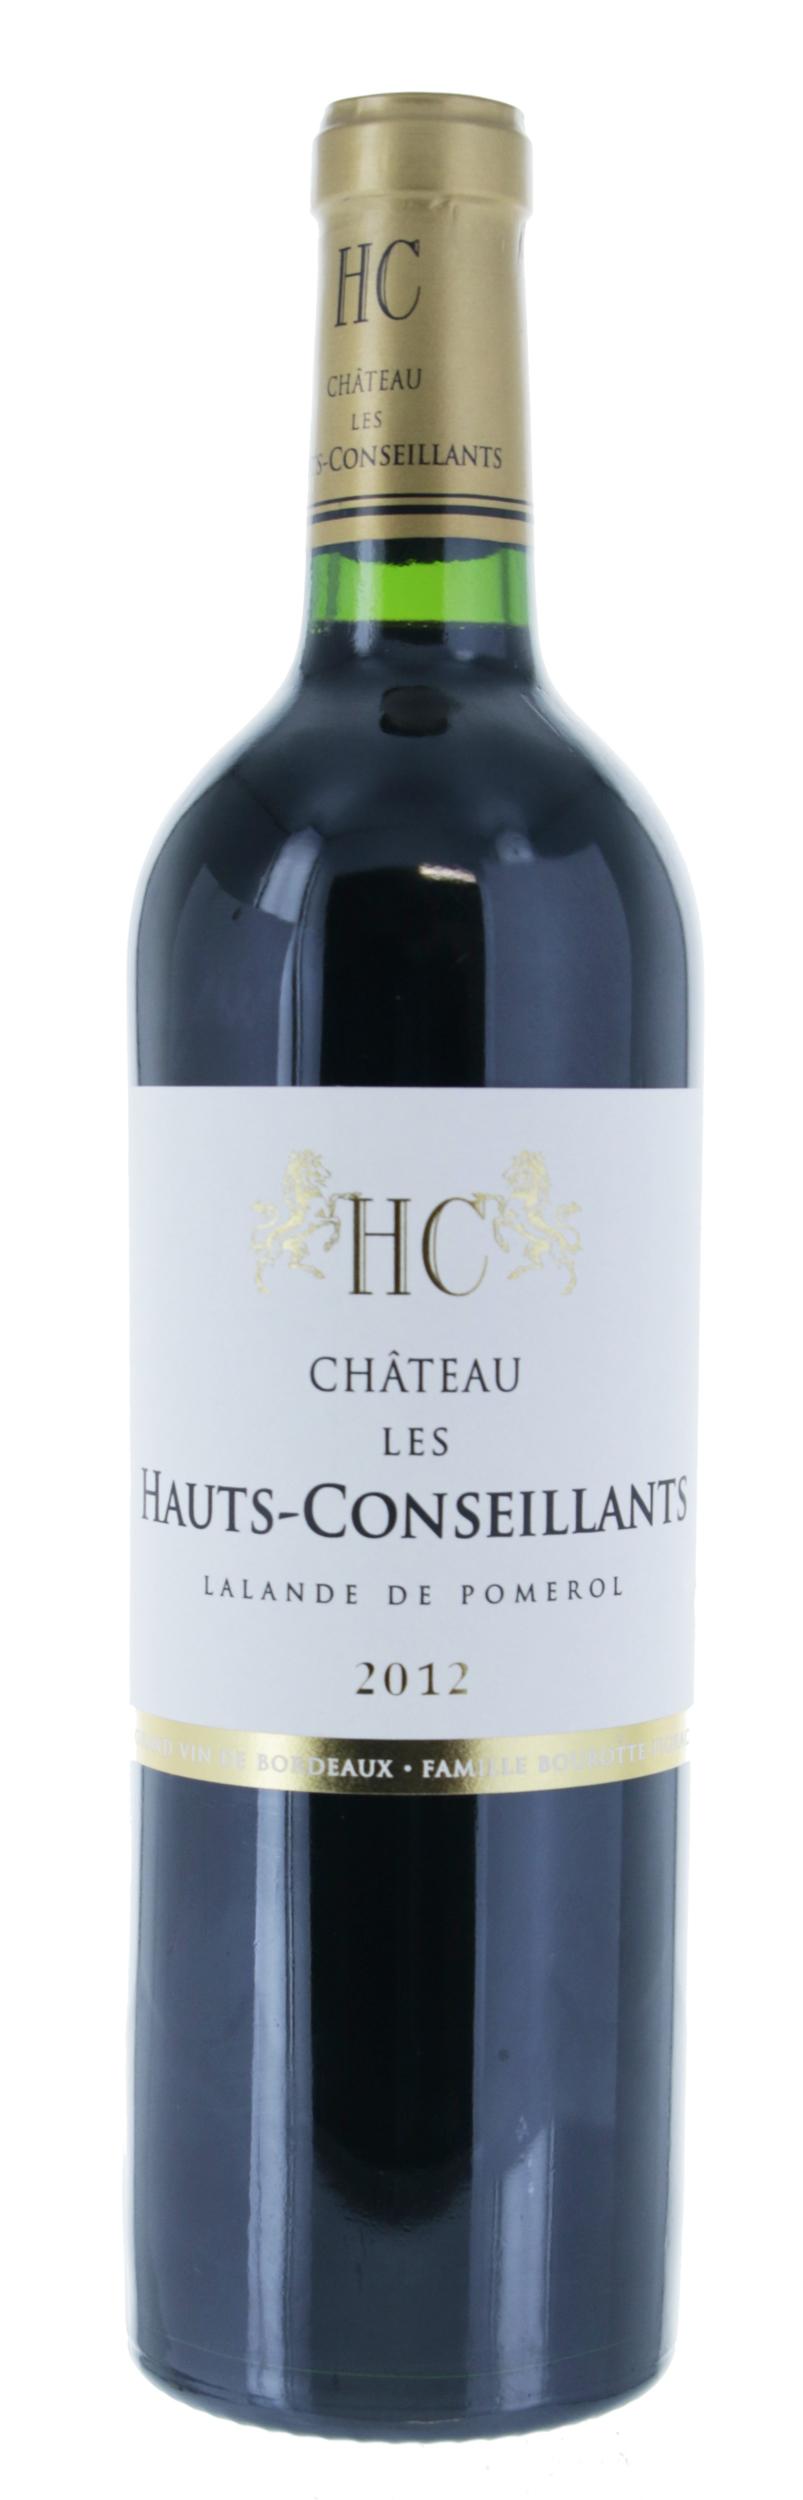 Lalande de pomerol - Château Les Hauts Conseillants - 2012